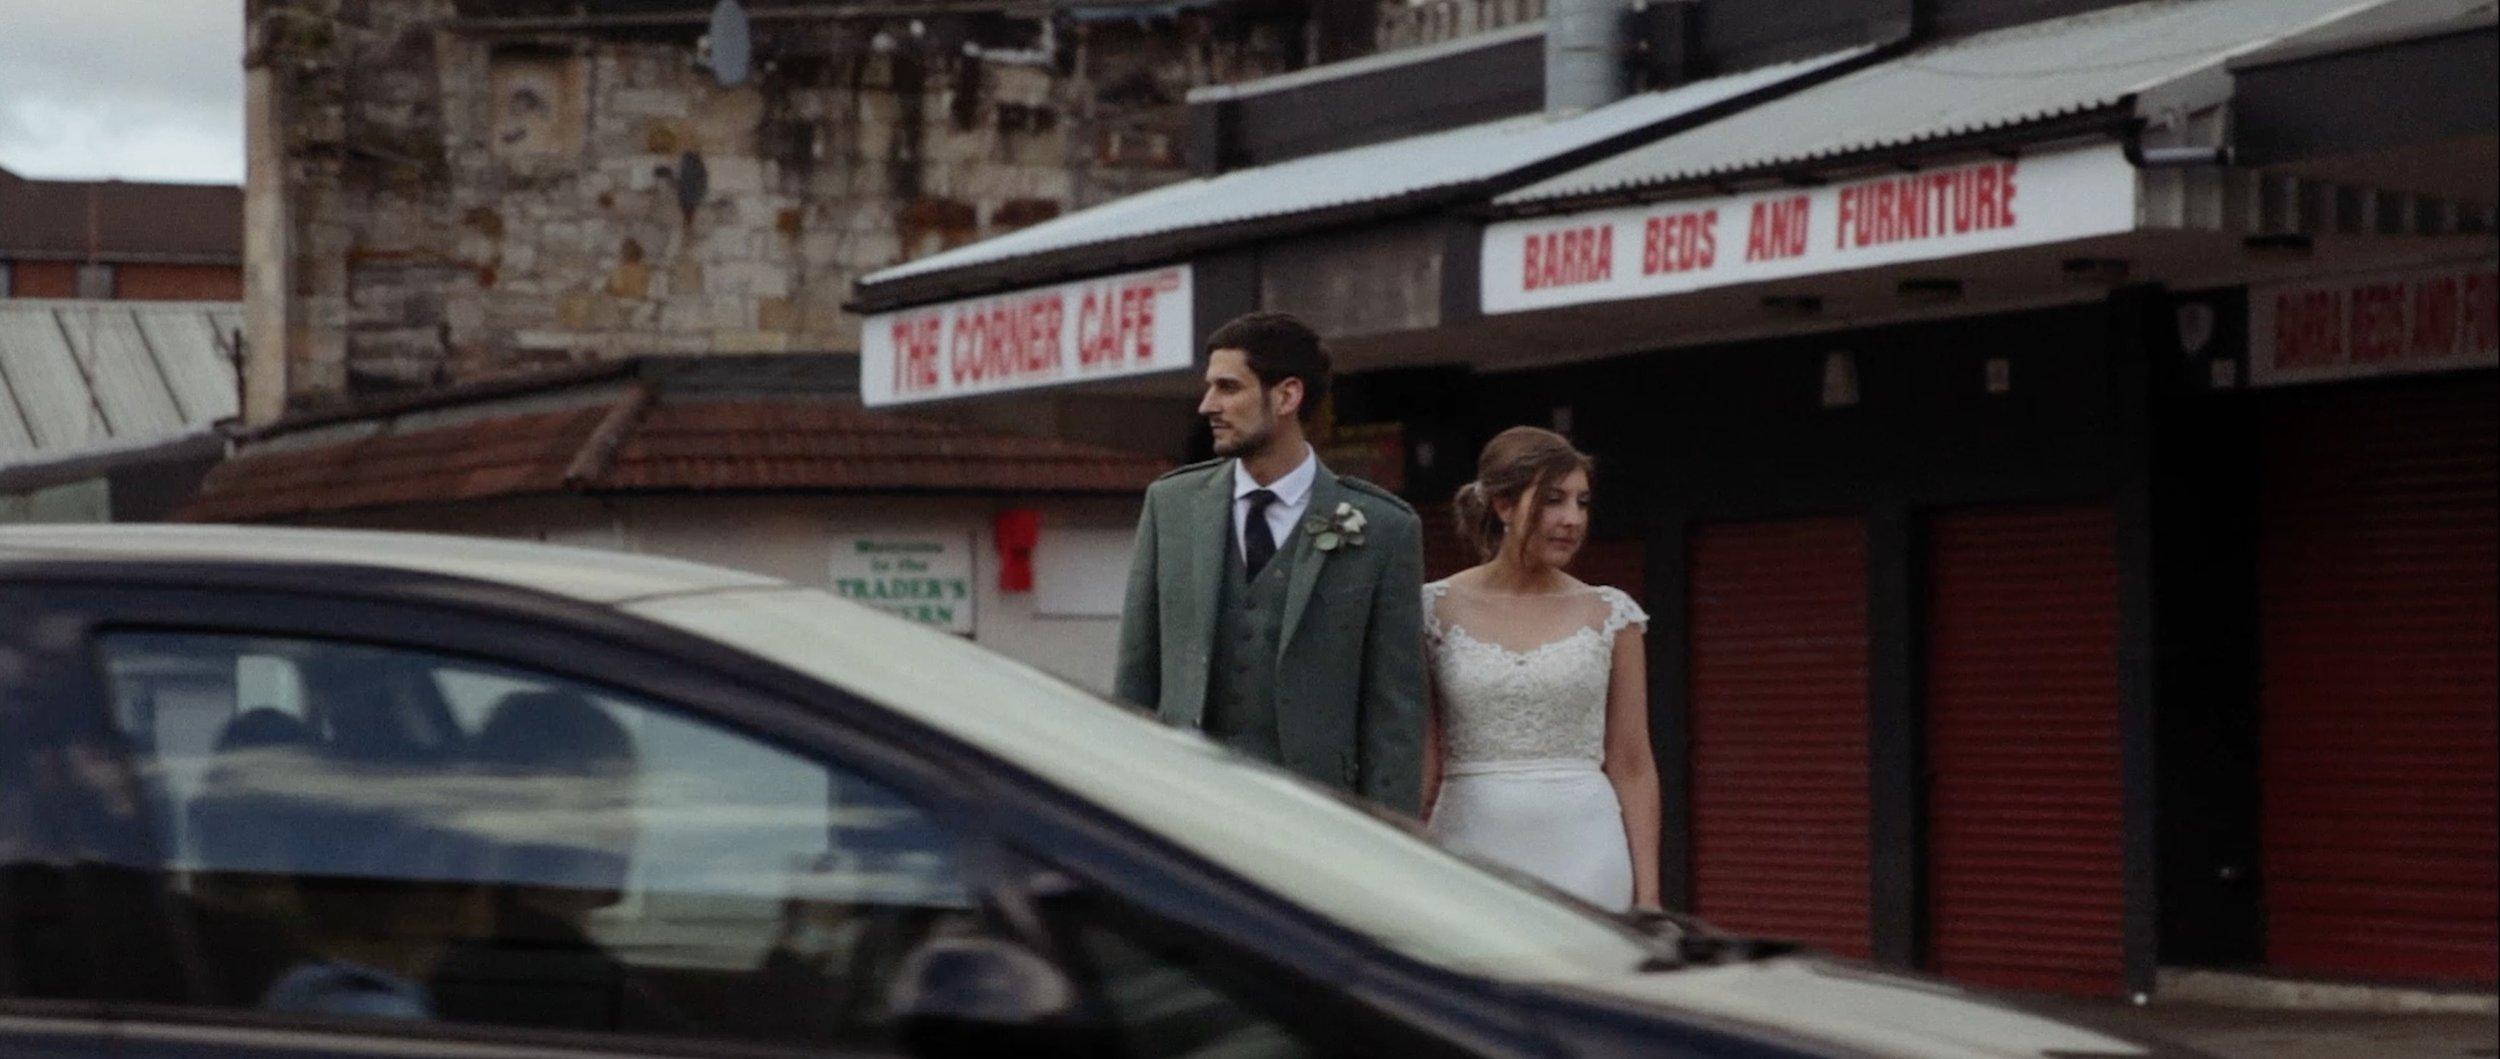 duns-castle-wedding-videographer_LL_05.jpg